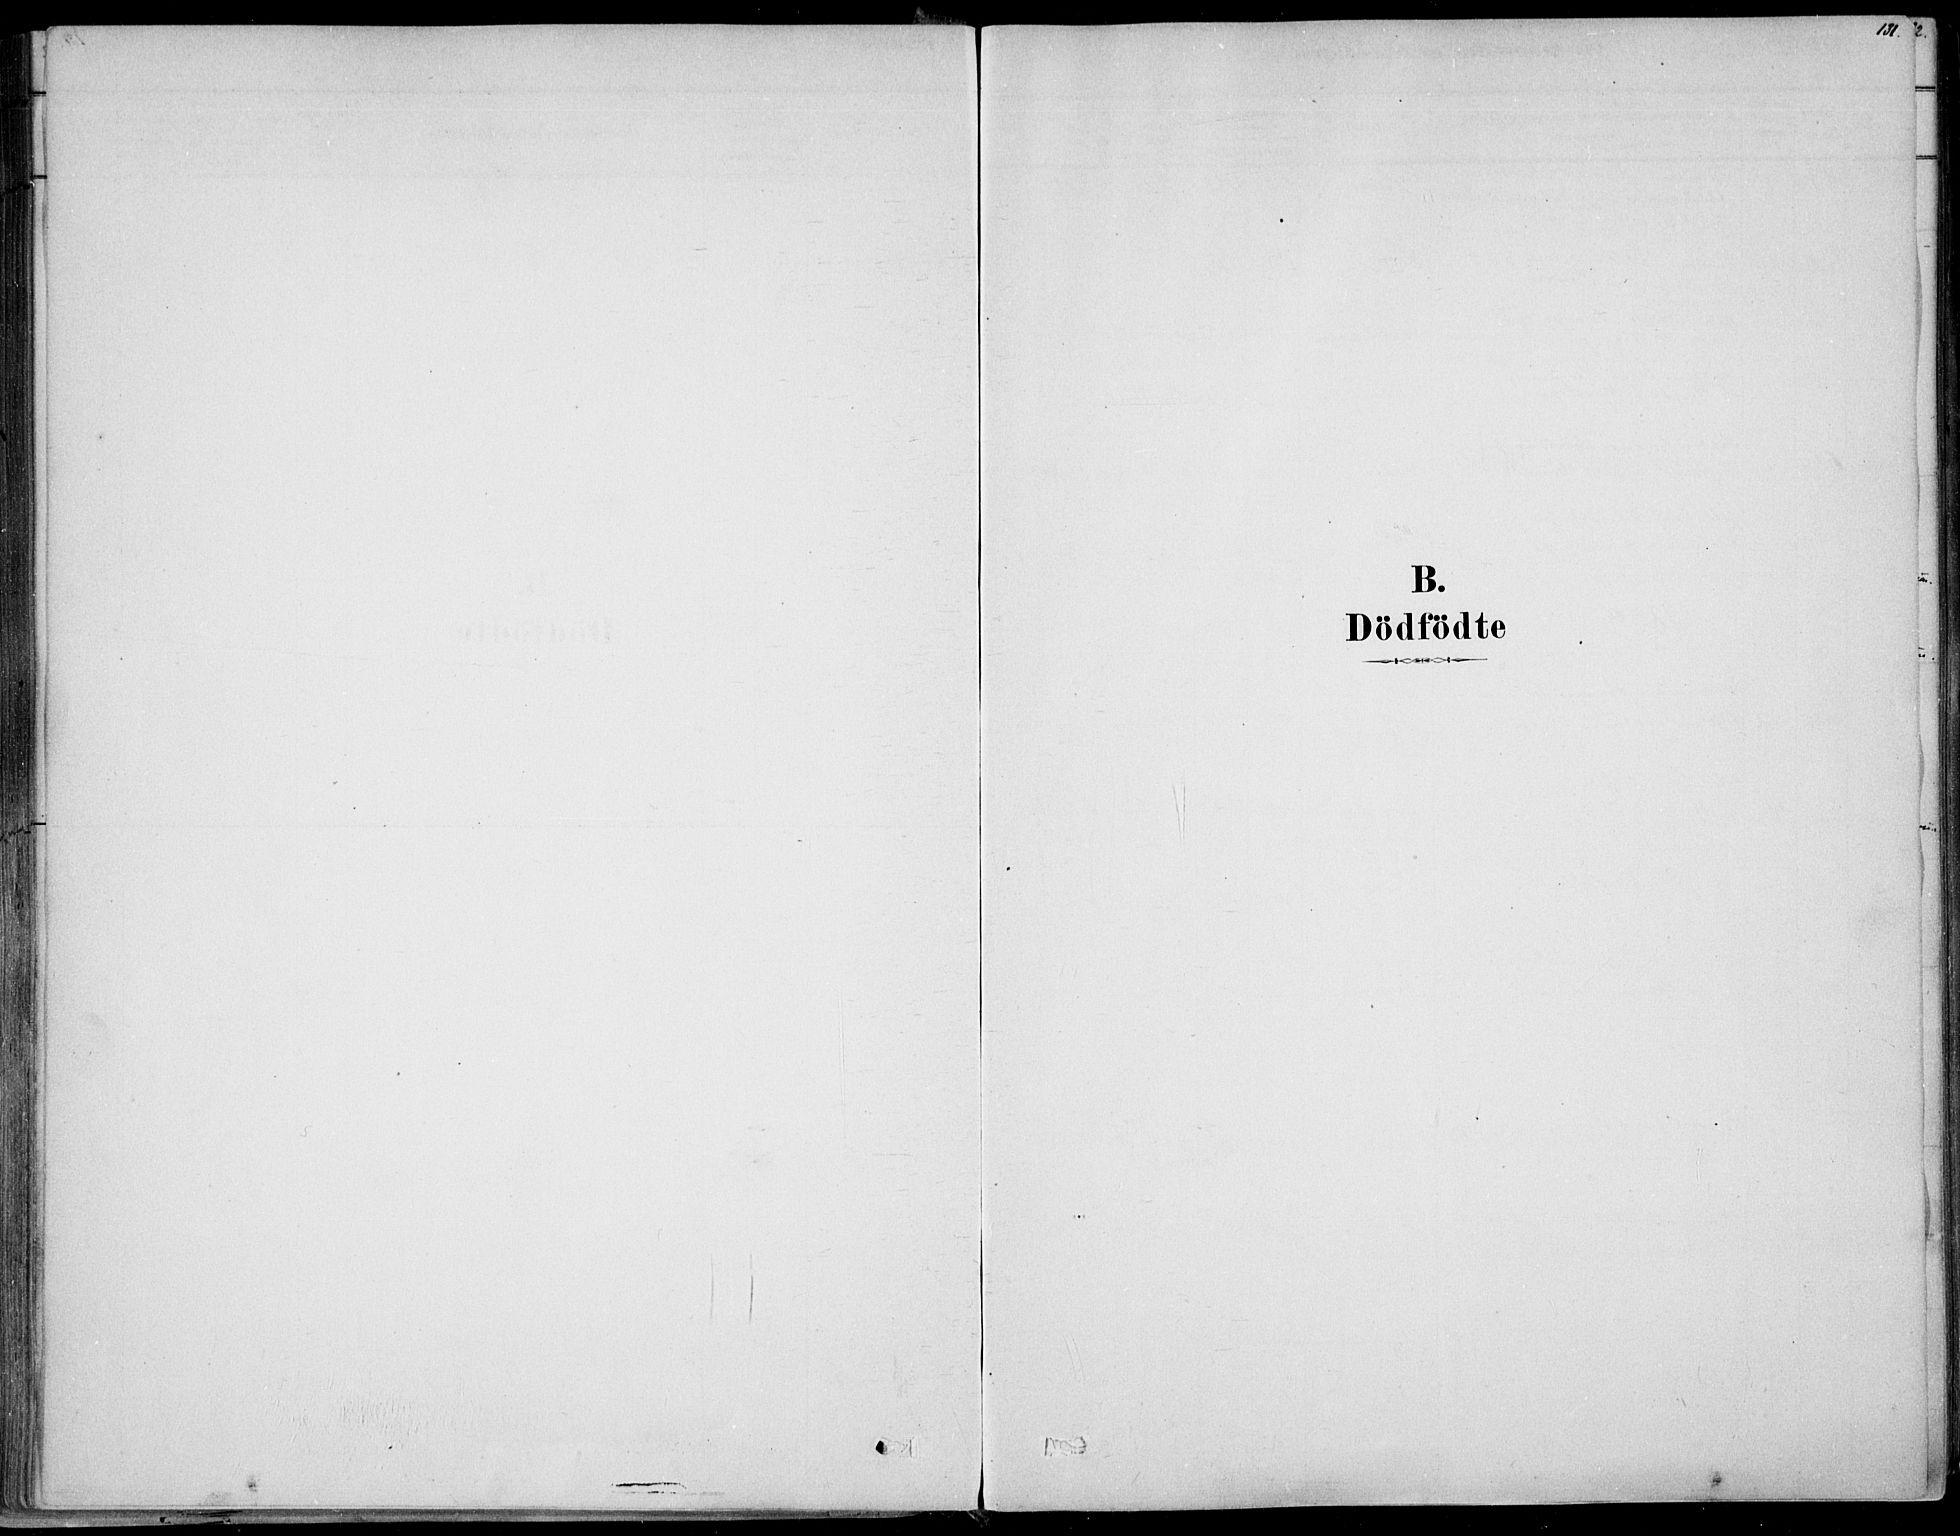 SAKO, Sem kirkebøker, F/Fb/L0004: Parish register (official) no. II 4, 1878-1891, p. 131